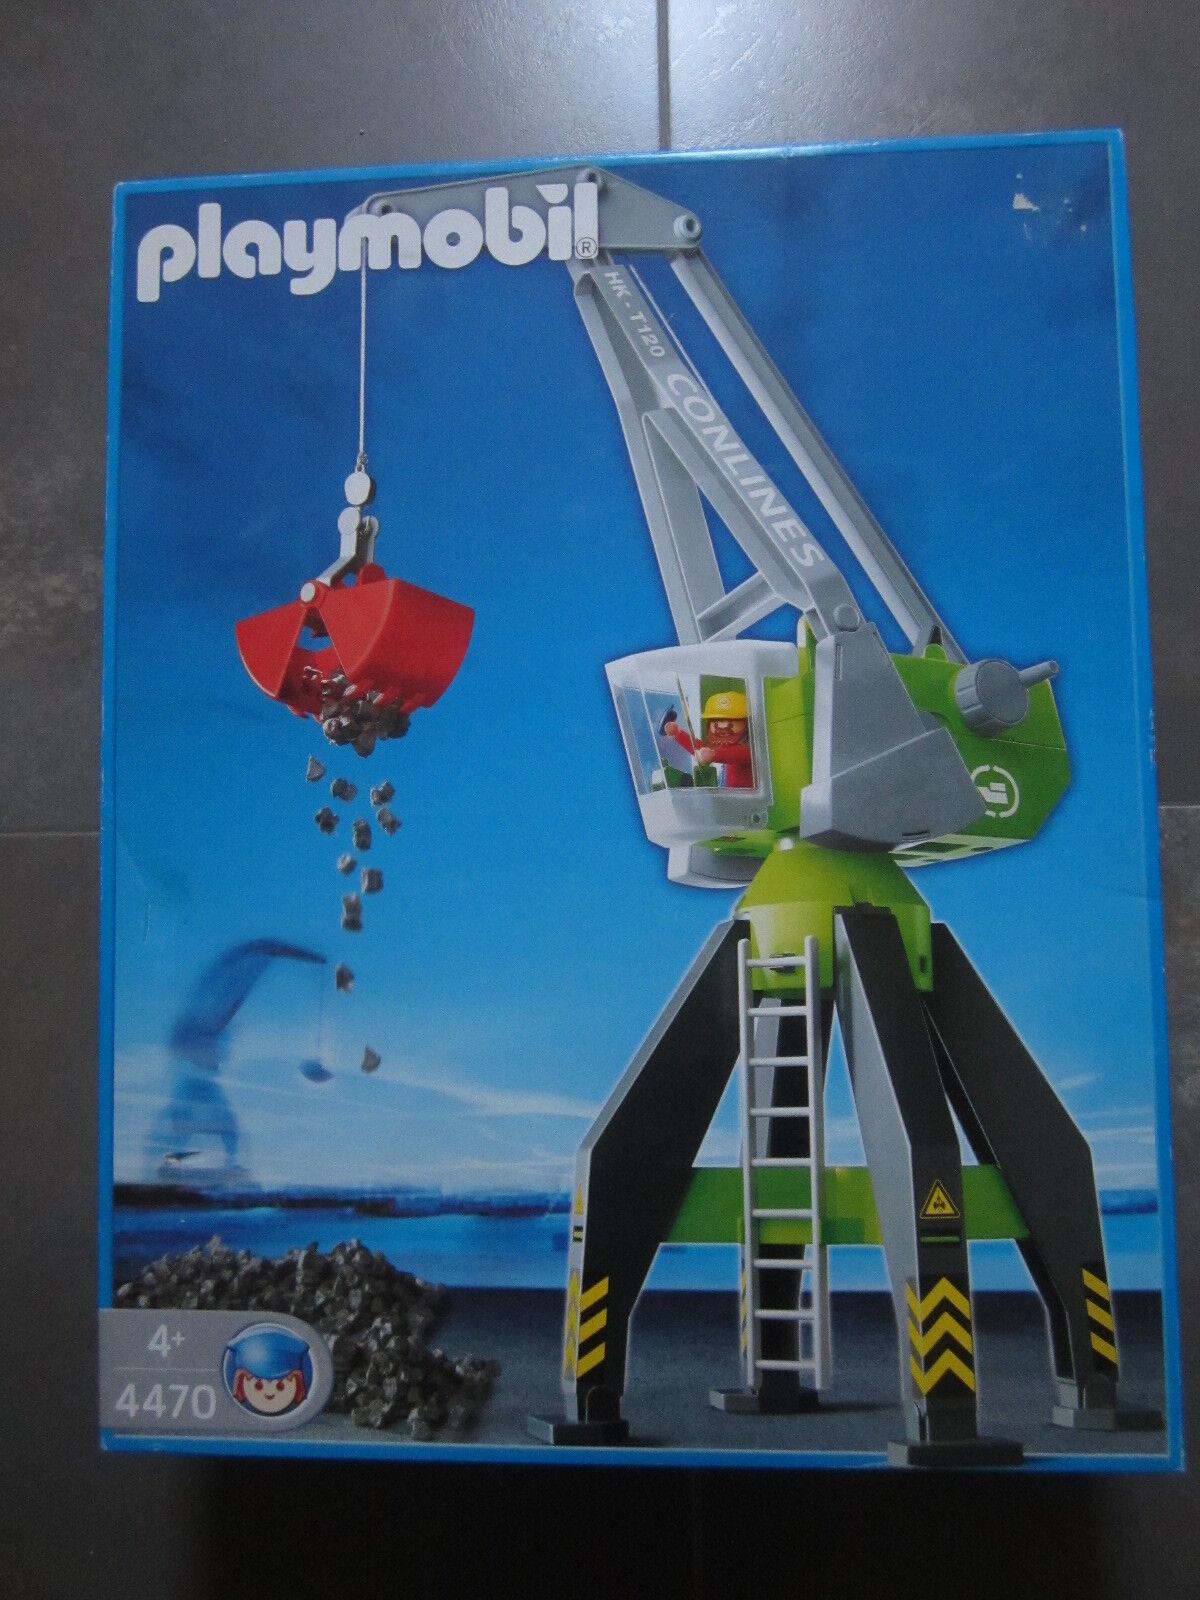 SET PLAYMOBIL REFERENCIA 4470 GRUA AÑO 2004